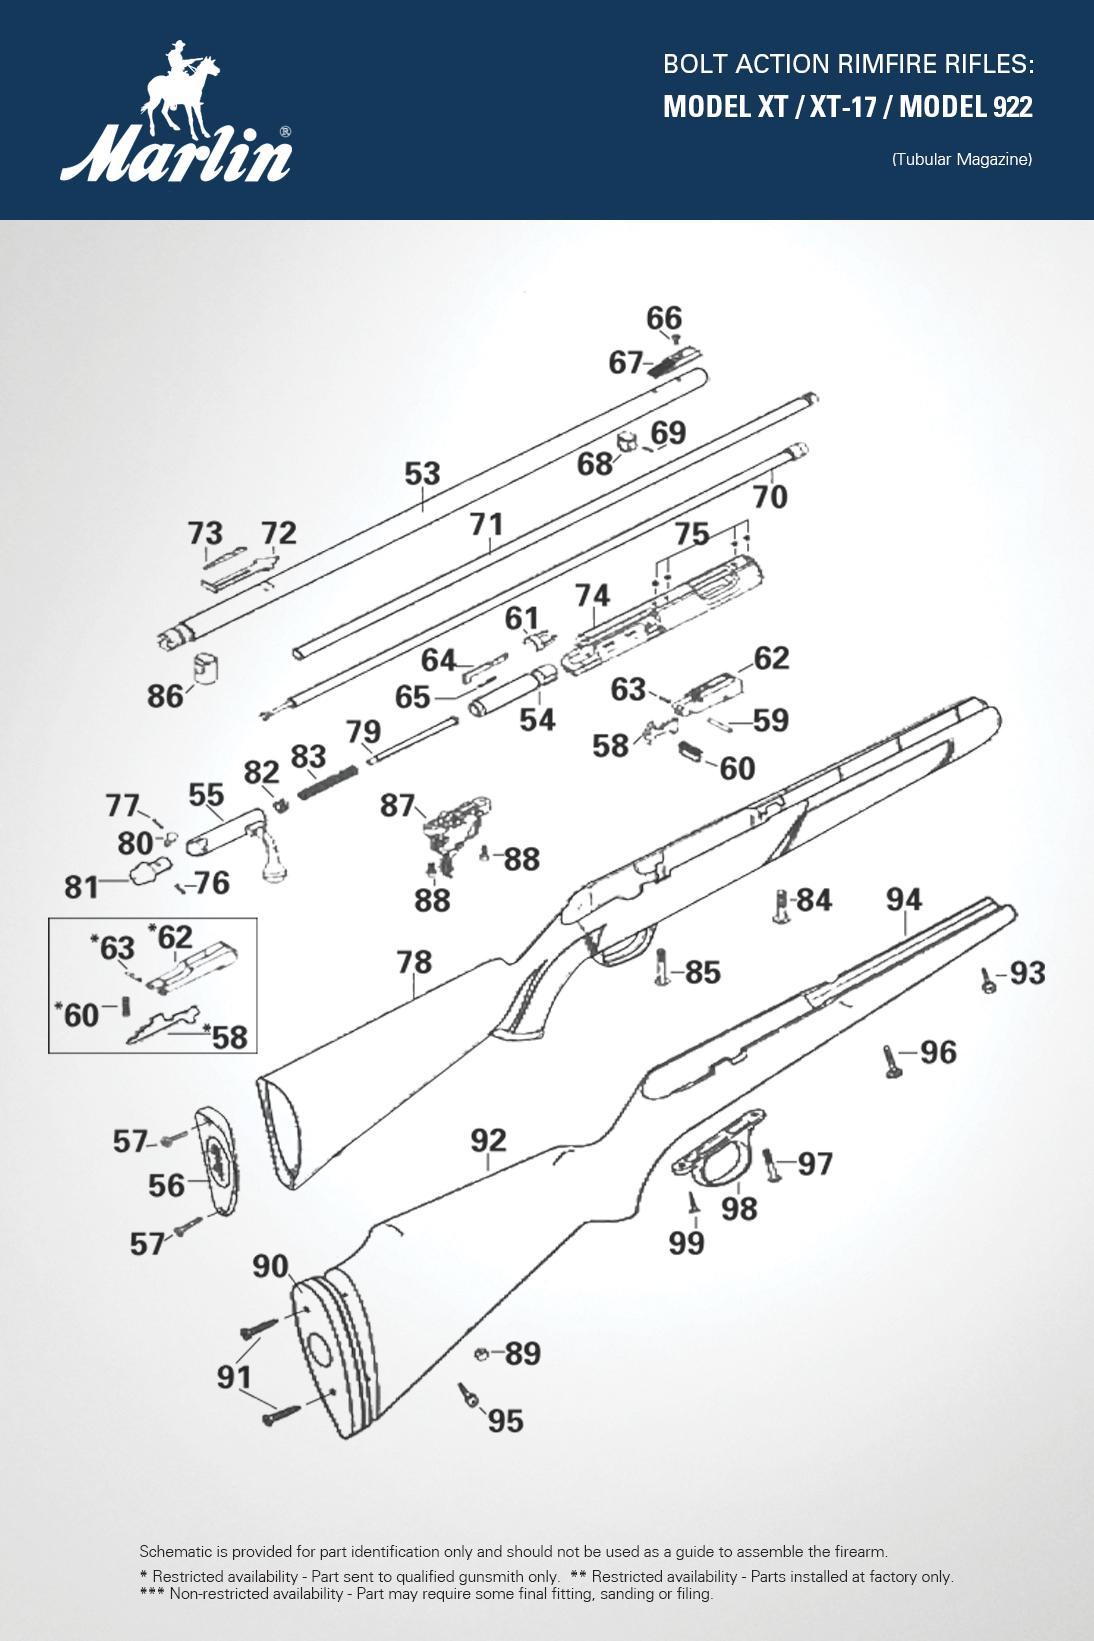 Model XT-22 & Magnum Tubular Magazine